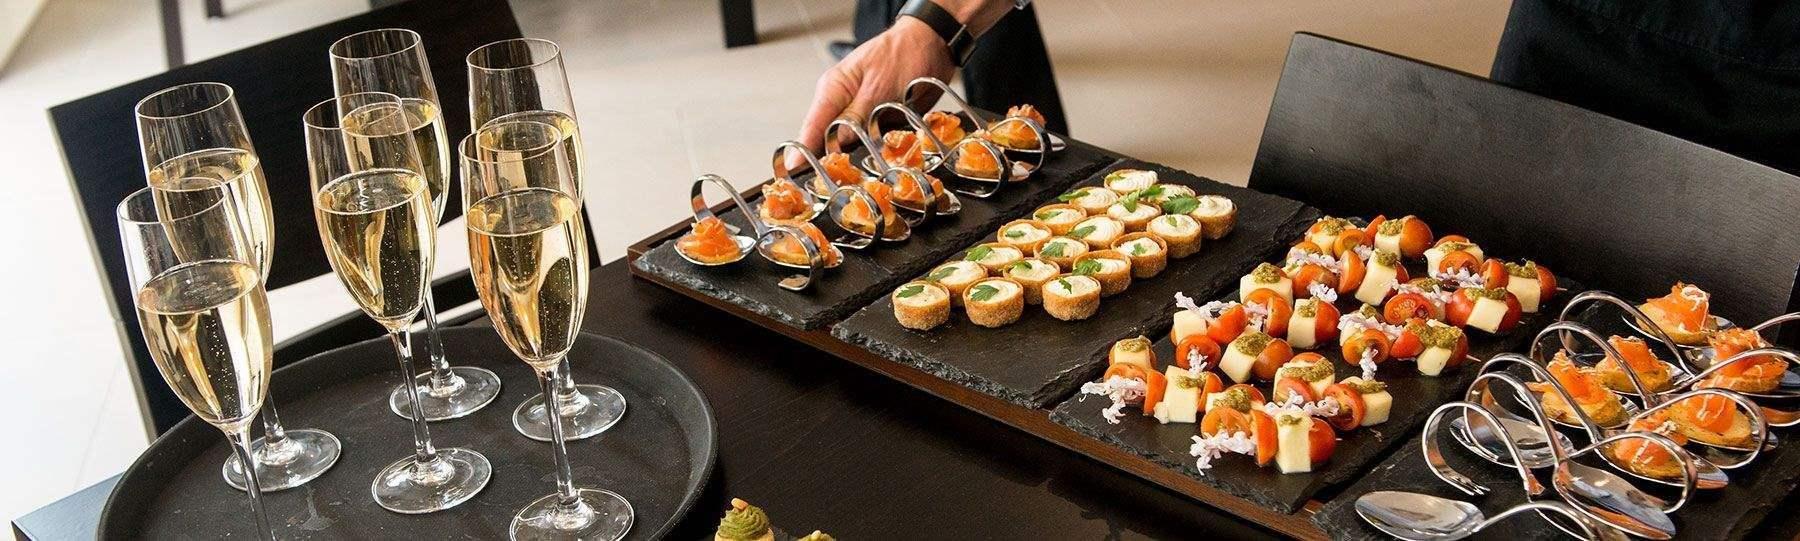 Events & Catering at Brizo Bar & Restaurant